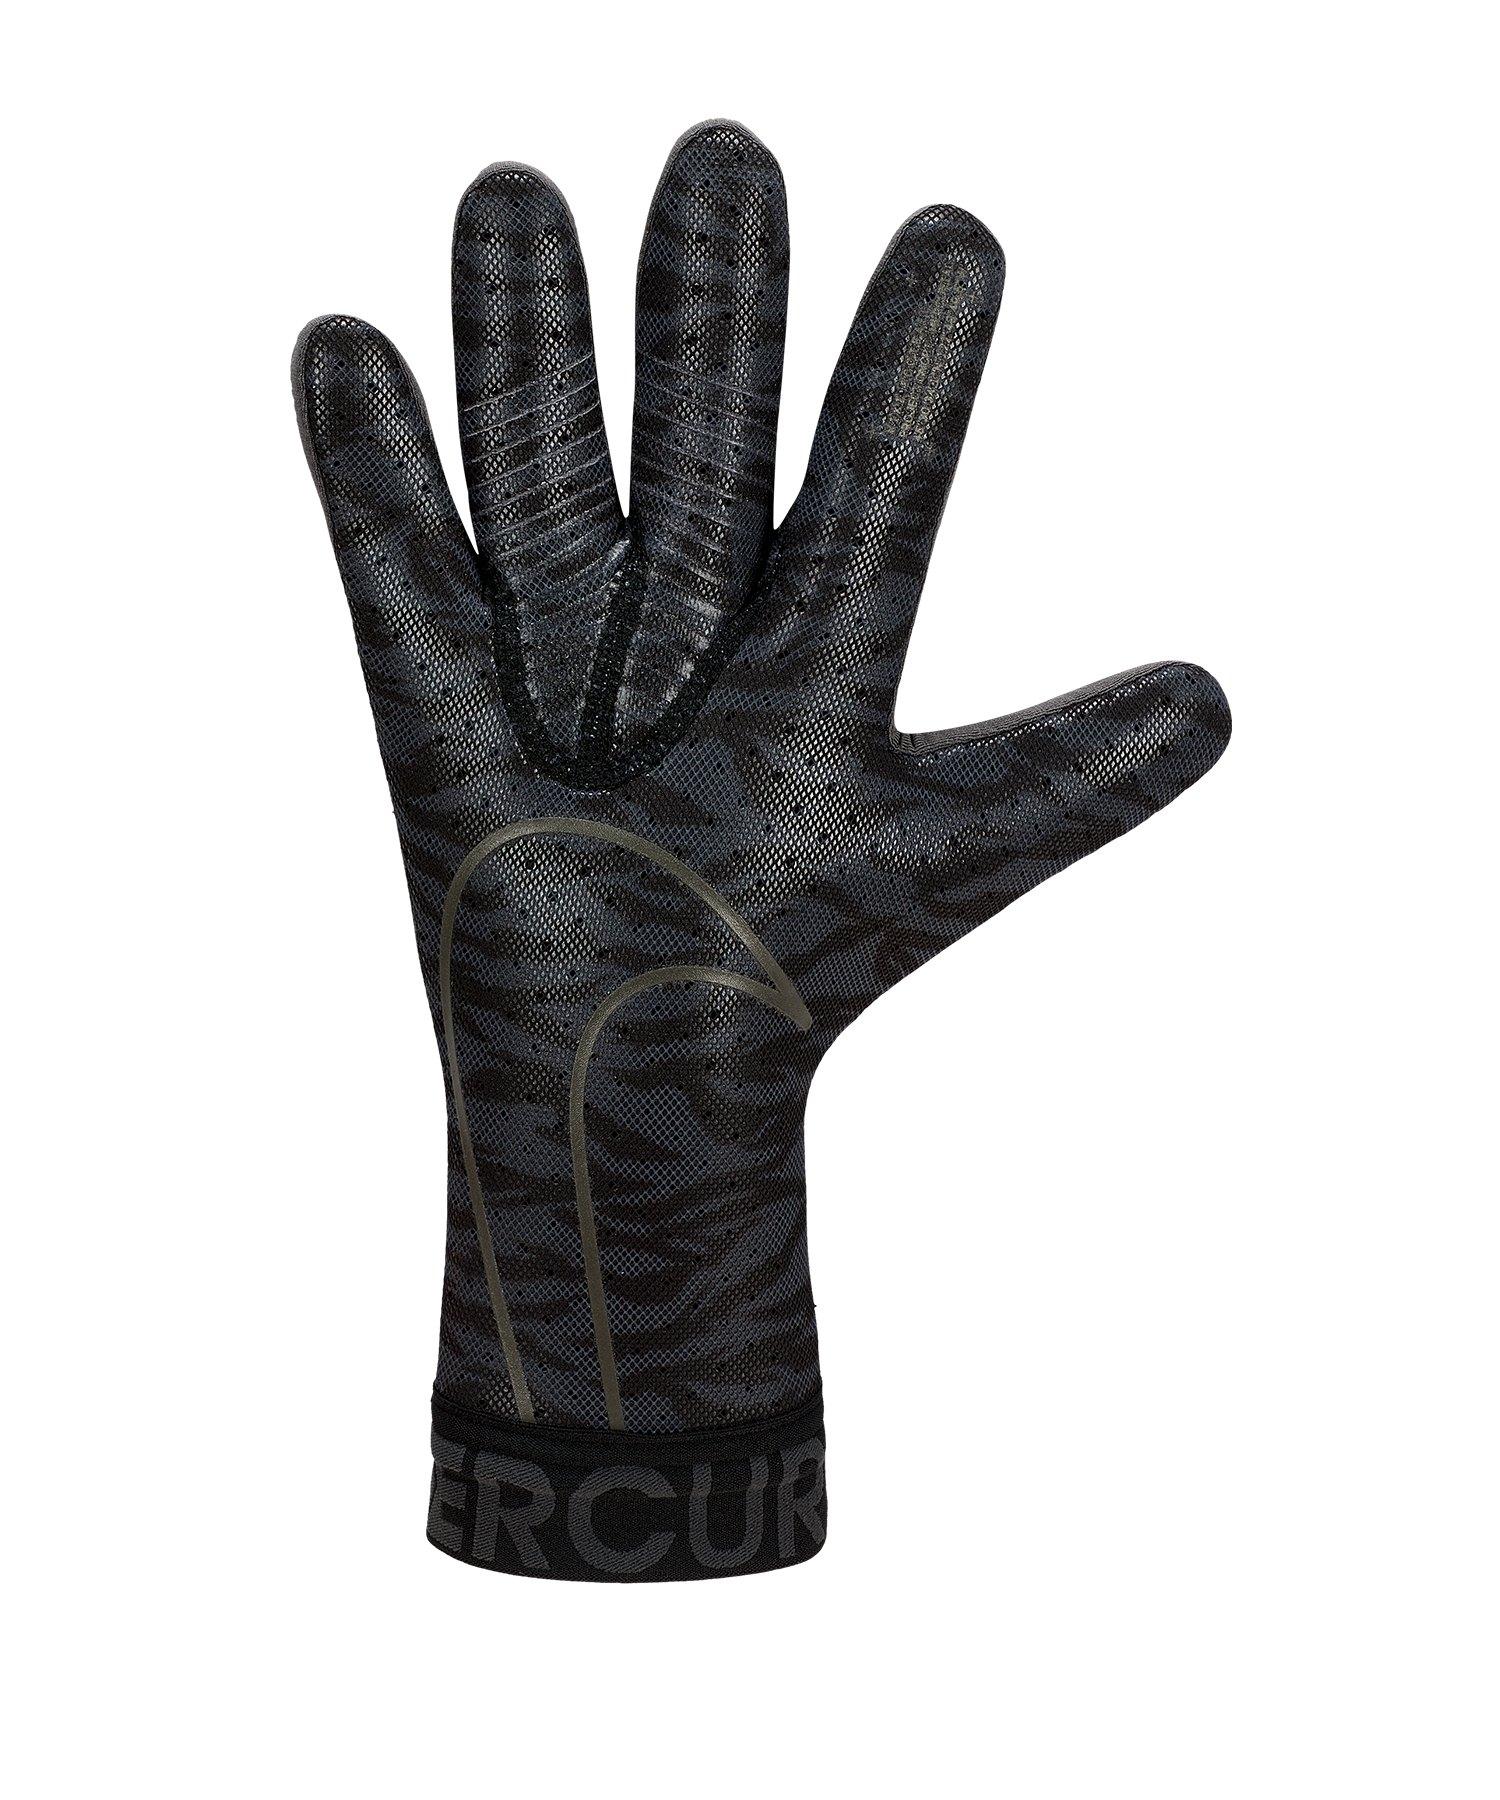 Nike Mercurial Touch Elite FA19 TW-Handschuh F010 - schwarz